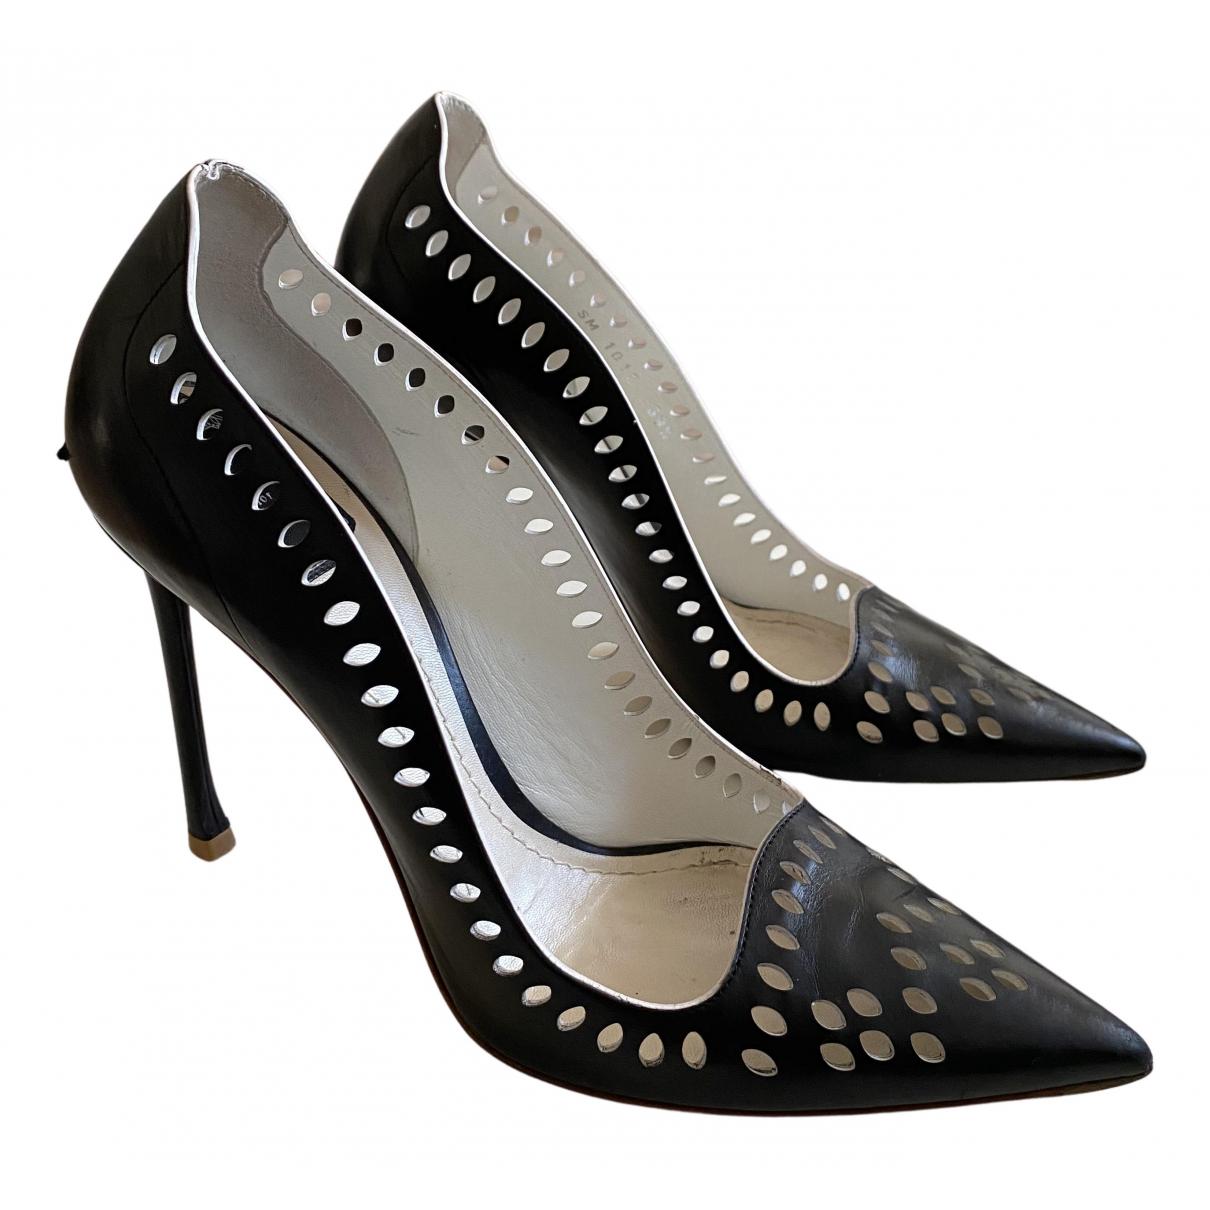 Dior N Black Leather Heels for Women 39.5 EU